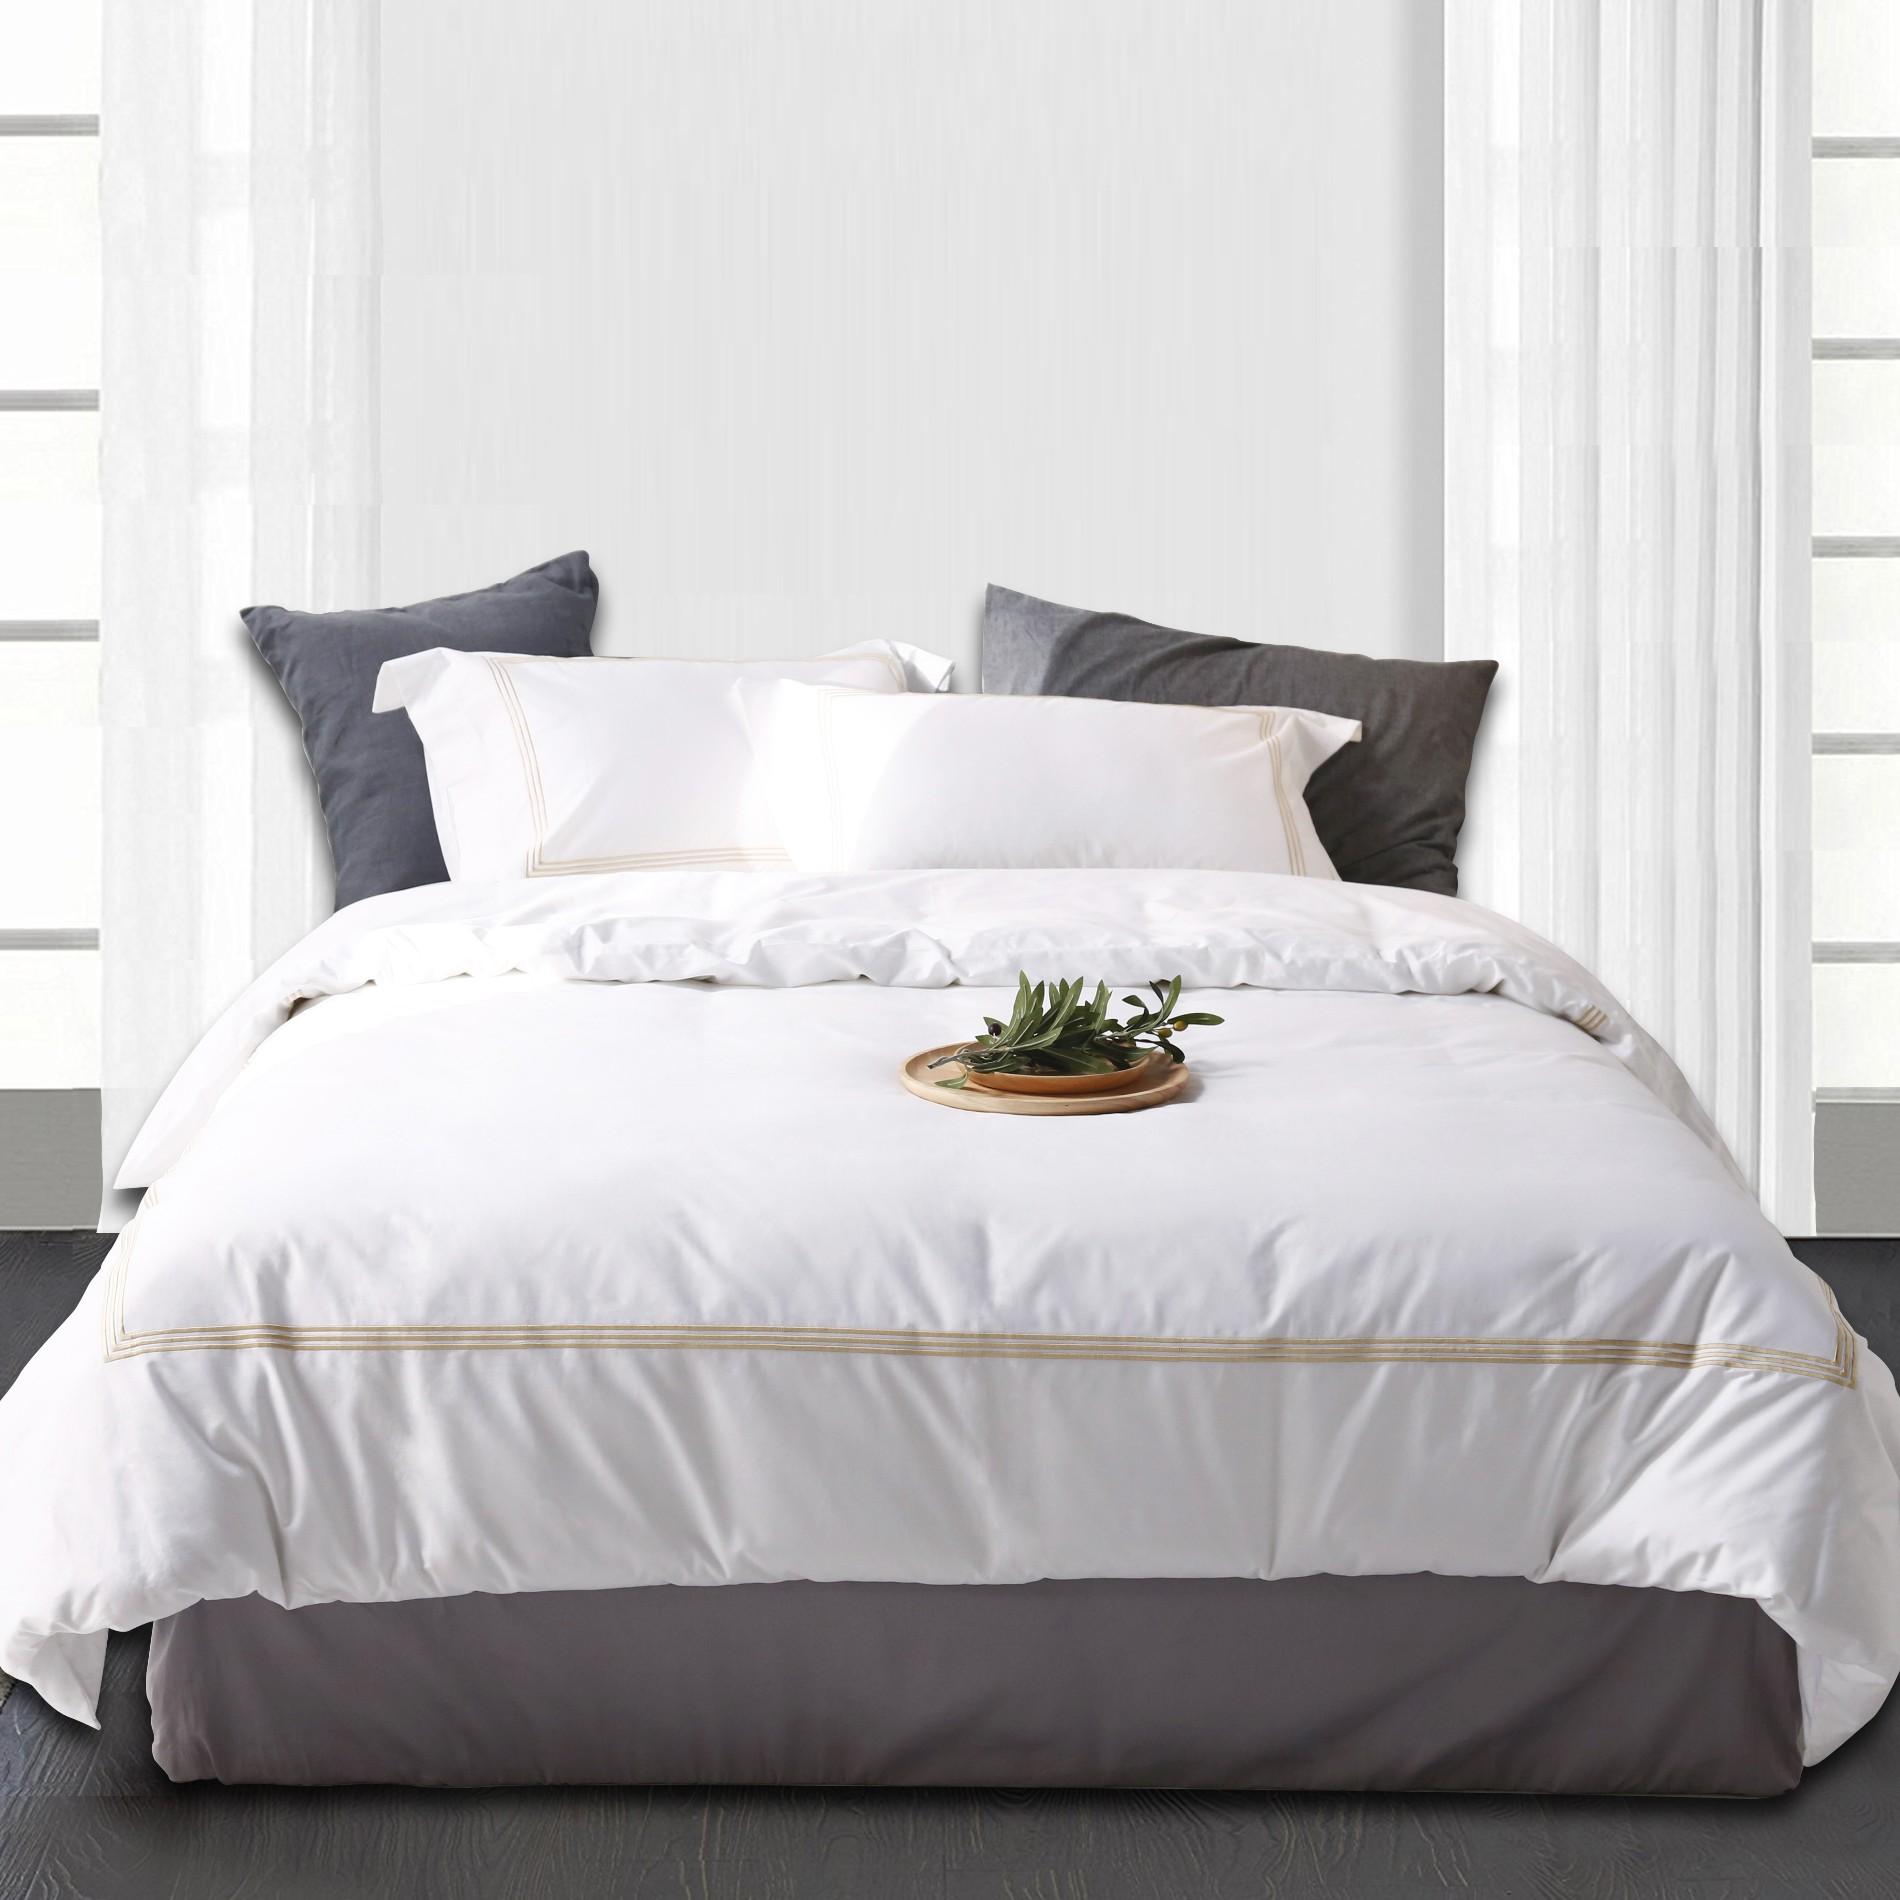 Hotel Bedding Set Manufacturers, Hotel Bedding Set Factory, Supply Hotel Bedding Set